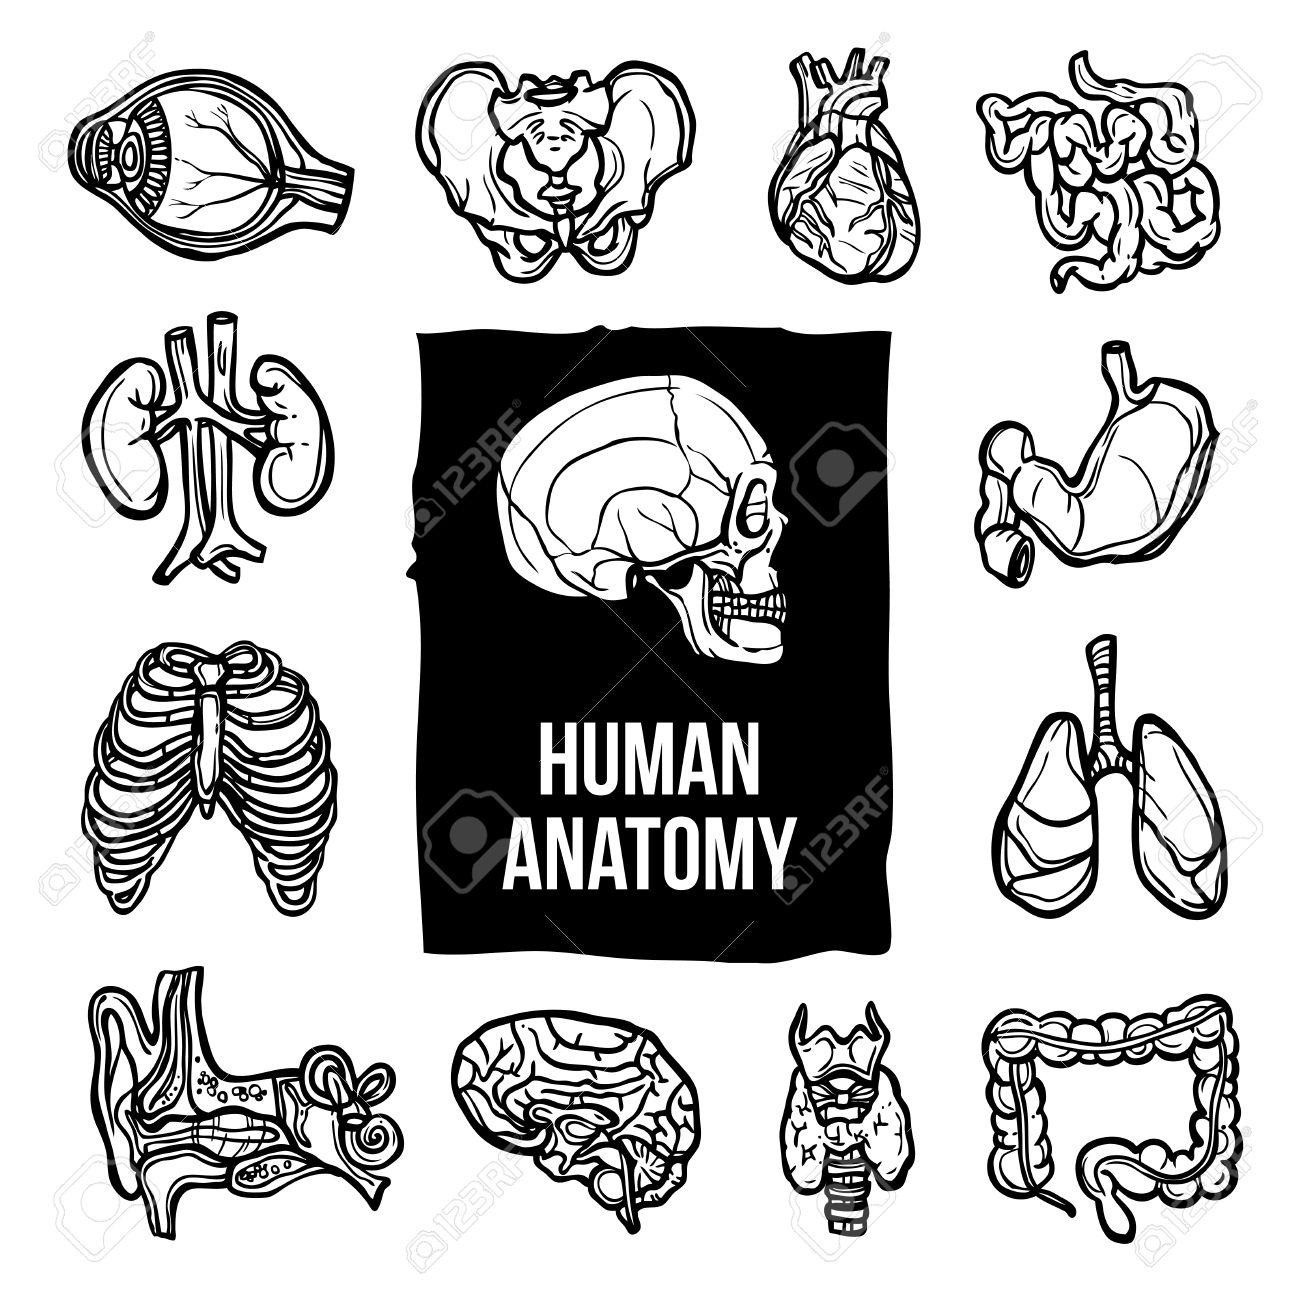 Human Anatomy Internal Body Organs Sketch Decorative Icons Set ...